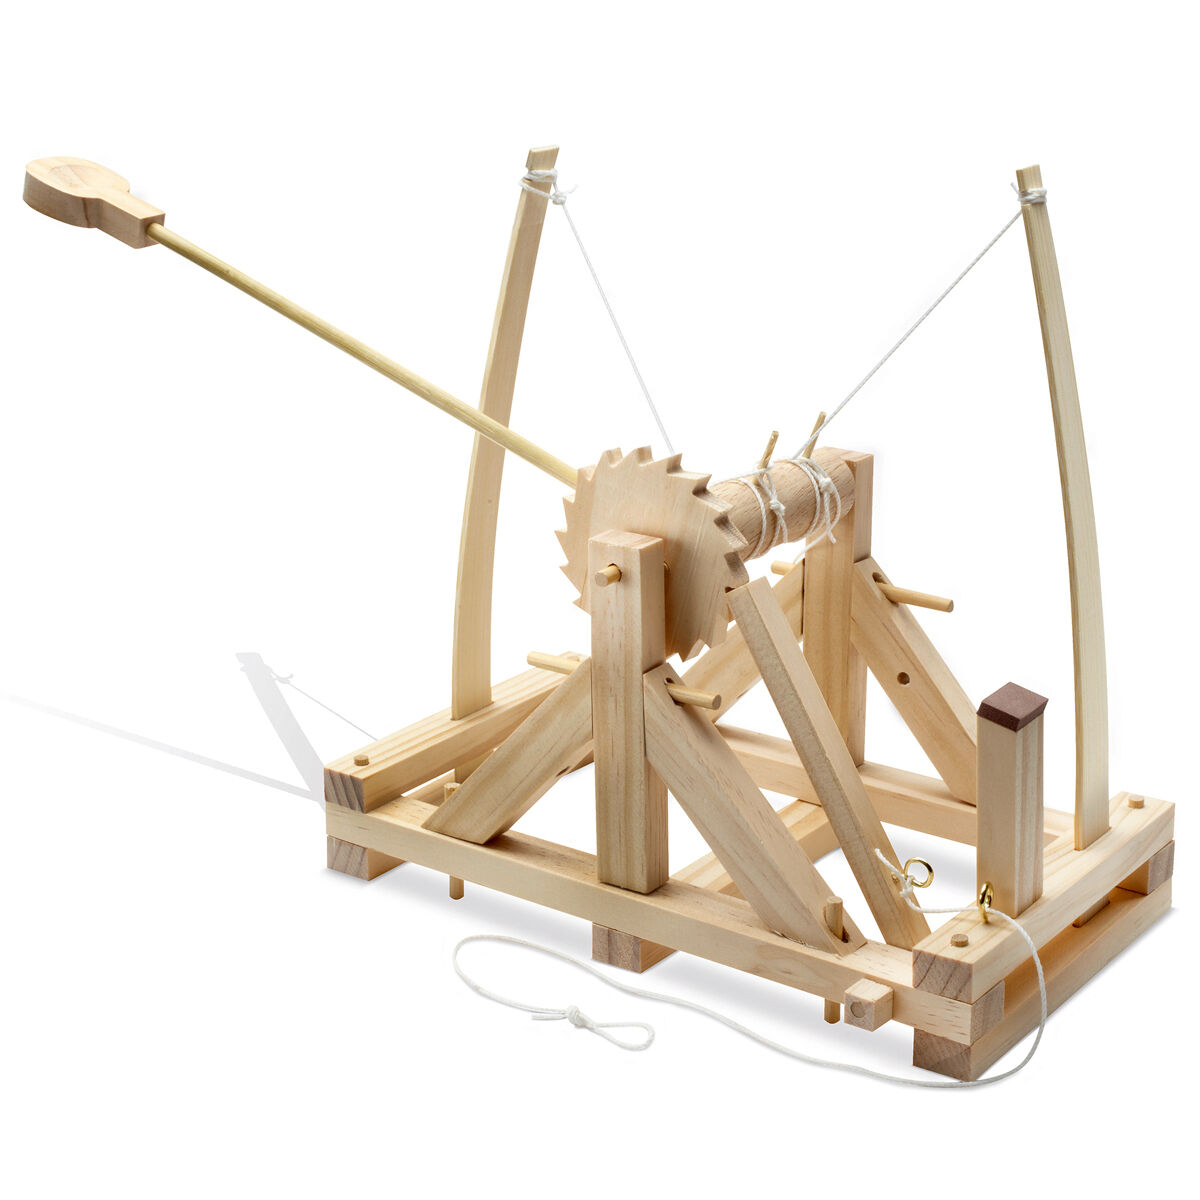 Desk Top Construction Kit - Catapult